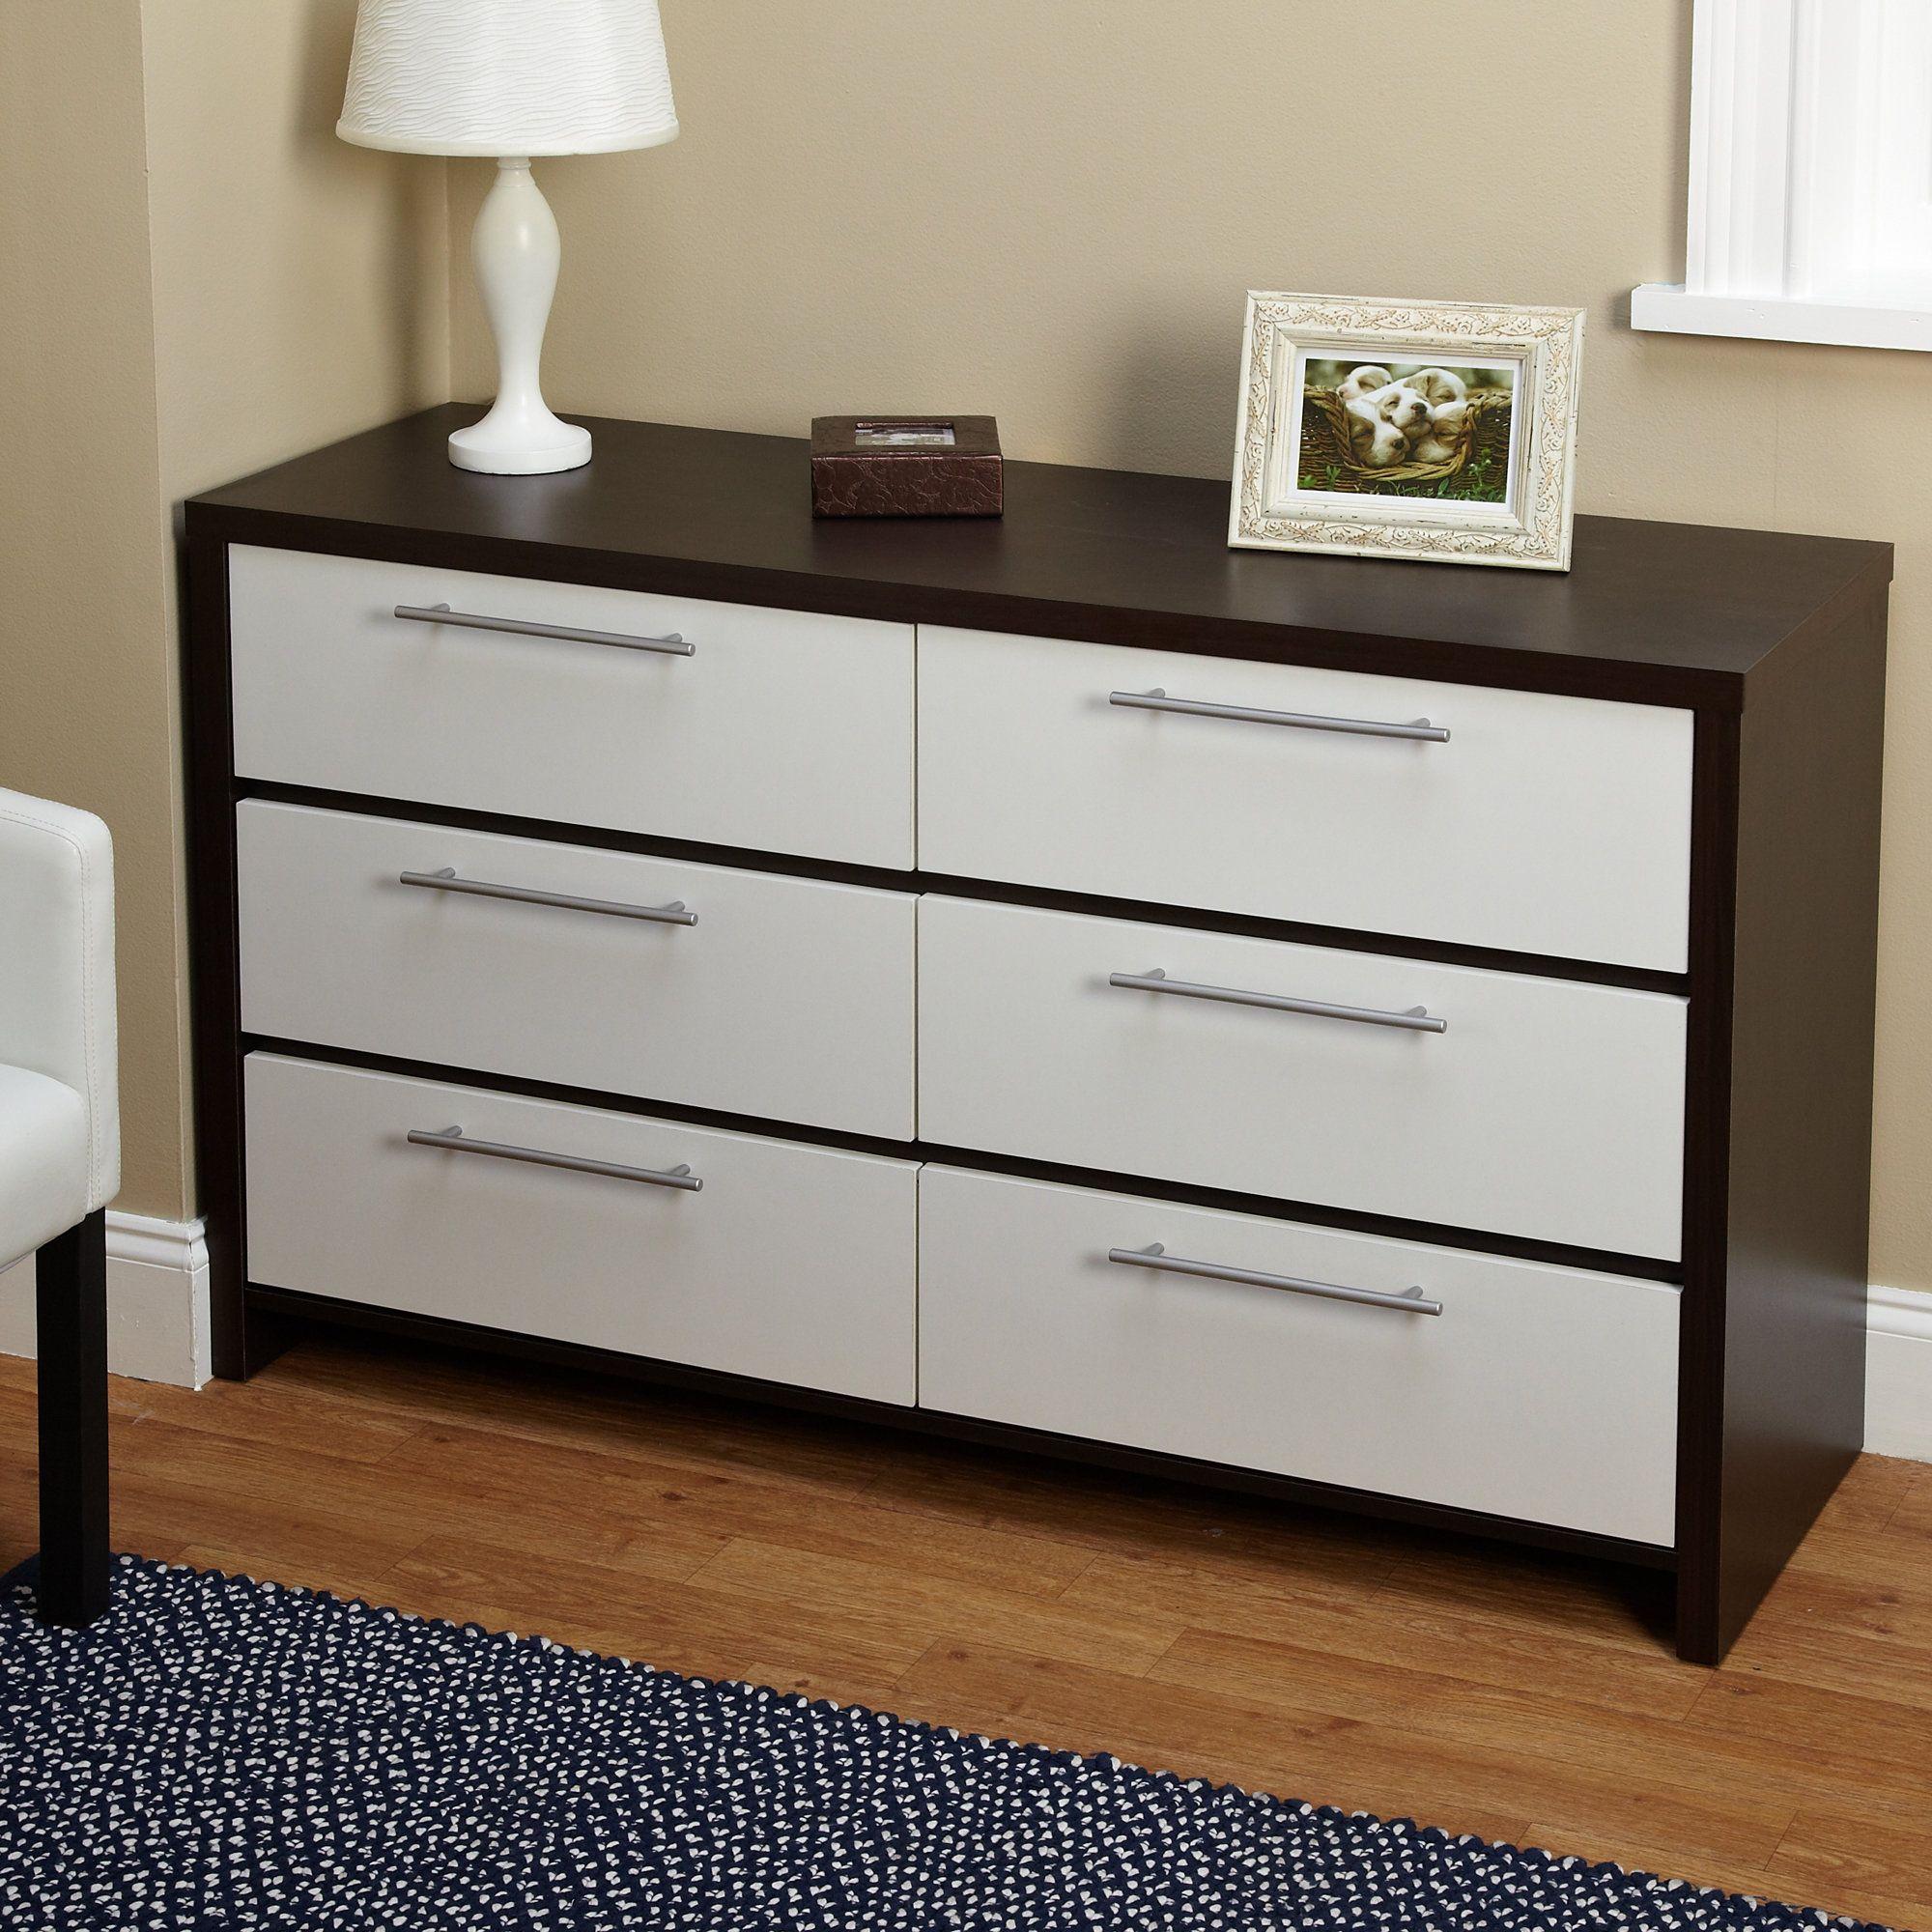 Clarkedale 6 Drawer Double Dresser Dresser Drawers 6 Drawer Dresser Chest Of Drawers